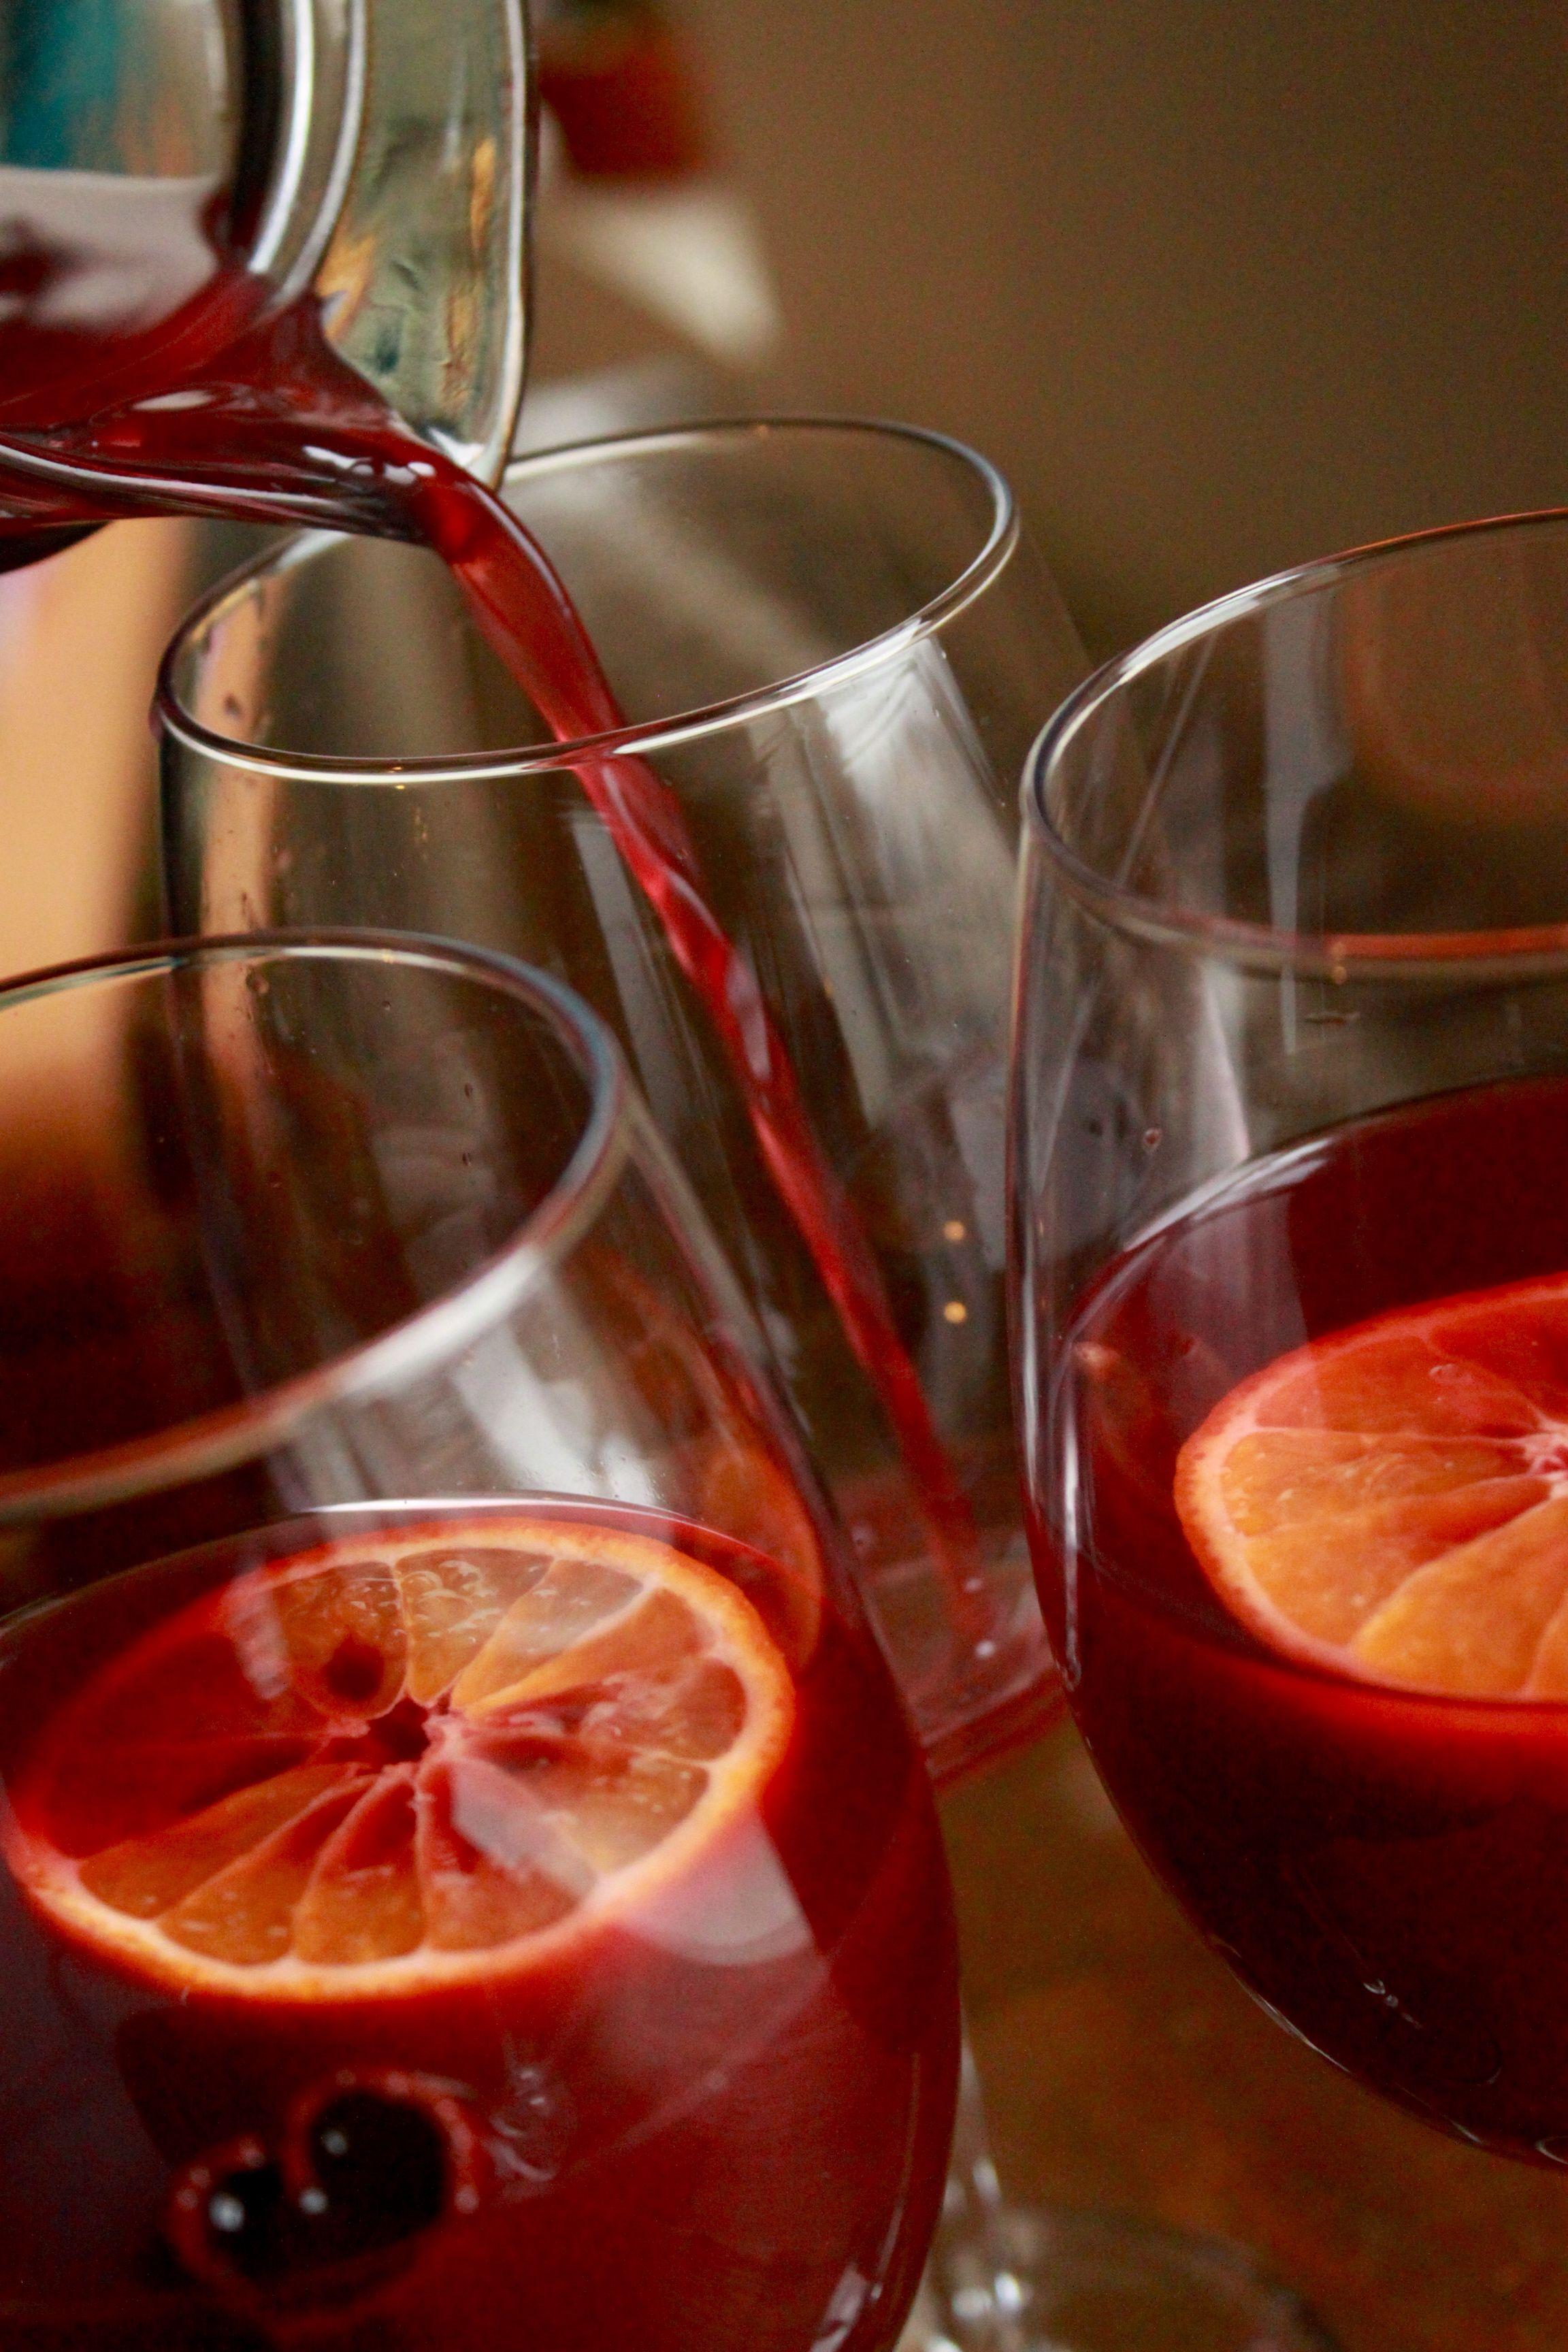 Sweet Spicy Red Wine Sangria Aka Sangria De Noche Buena Recipe On Food52 Recipe Red Wine Sangria Sweet And Spicy Spicy Sangria